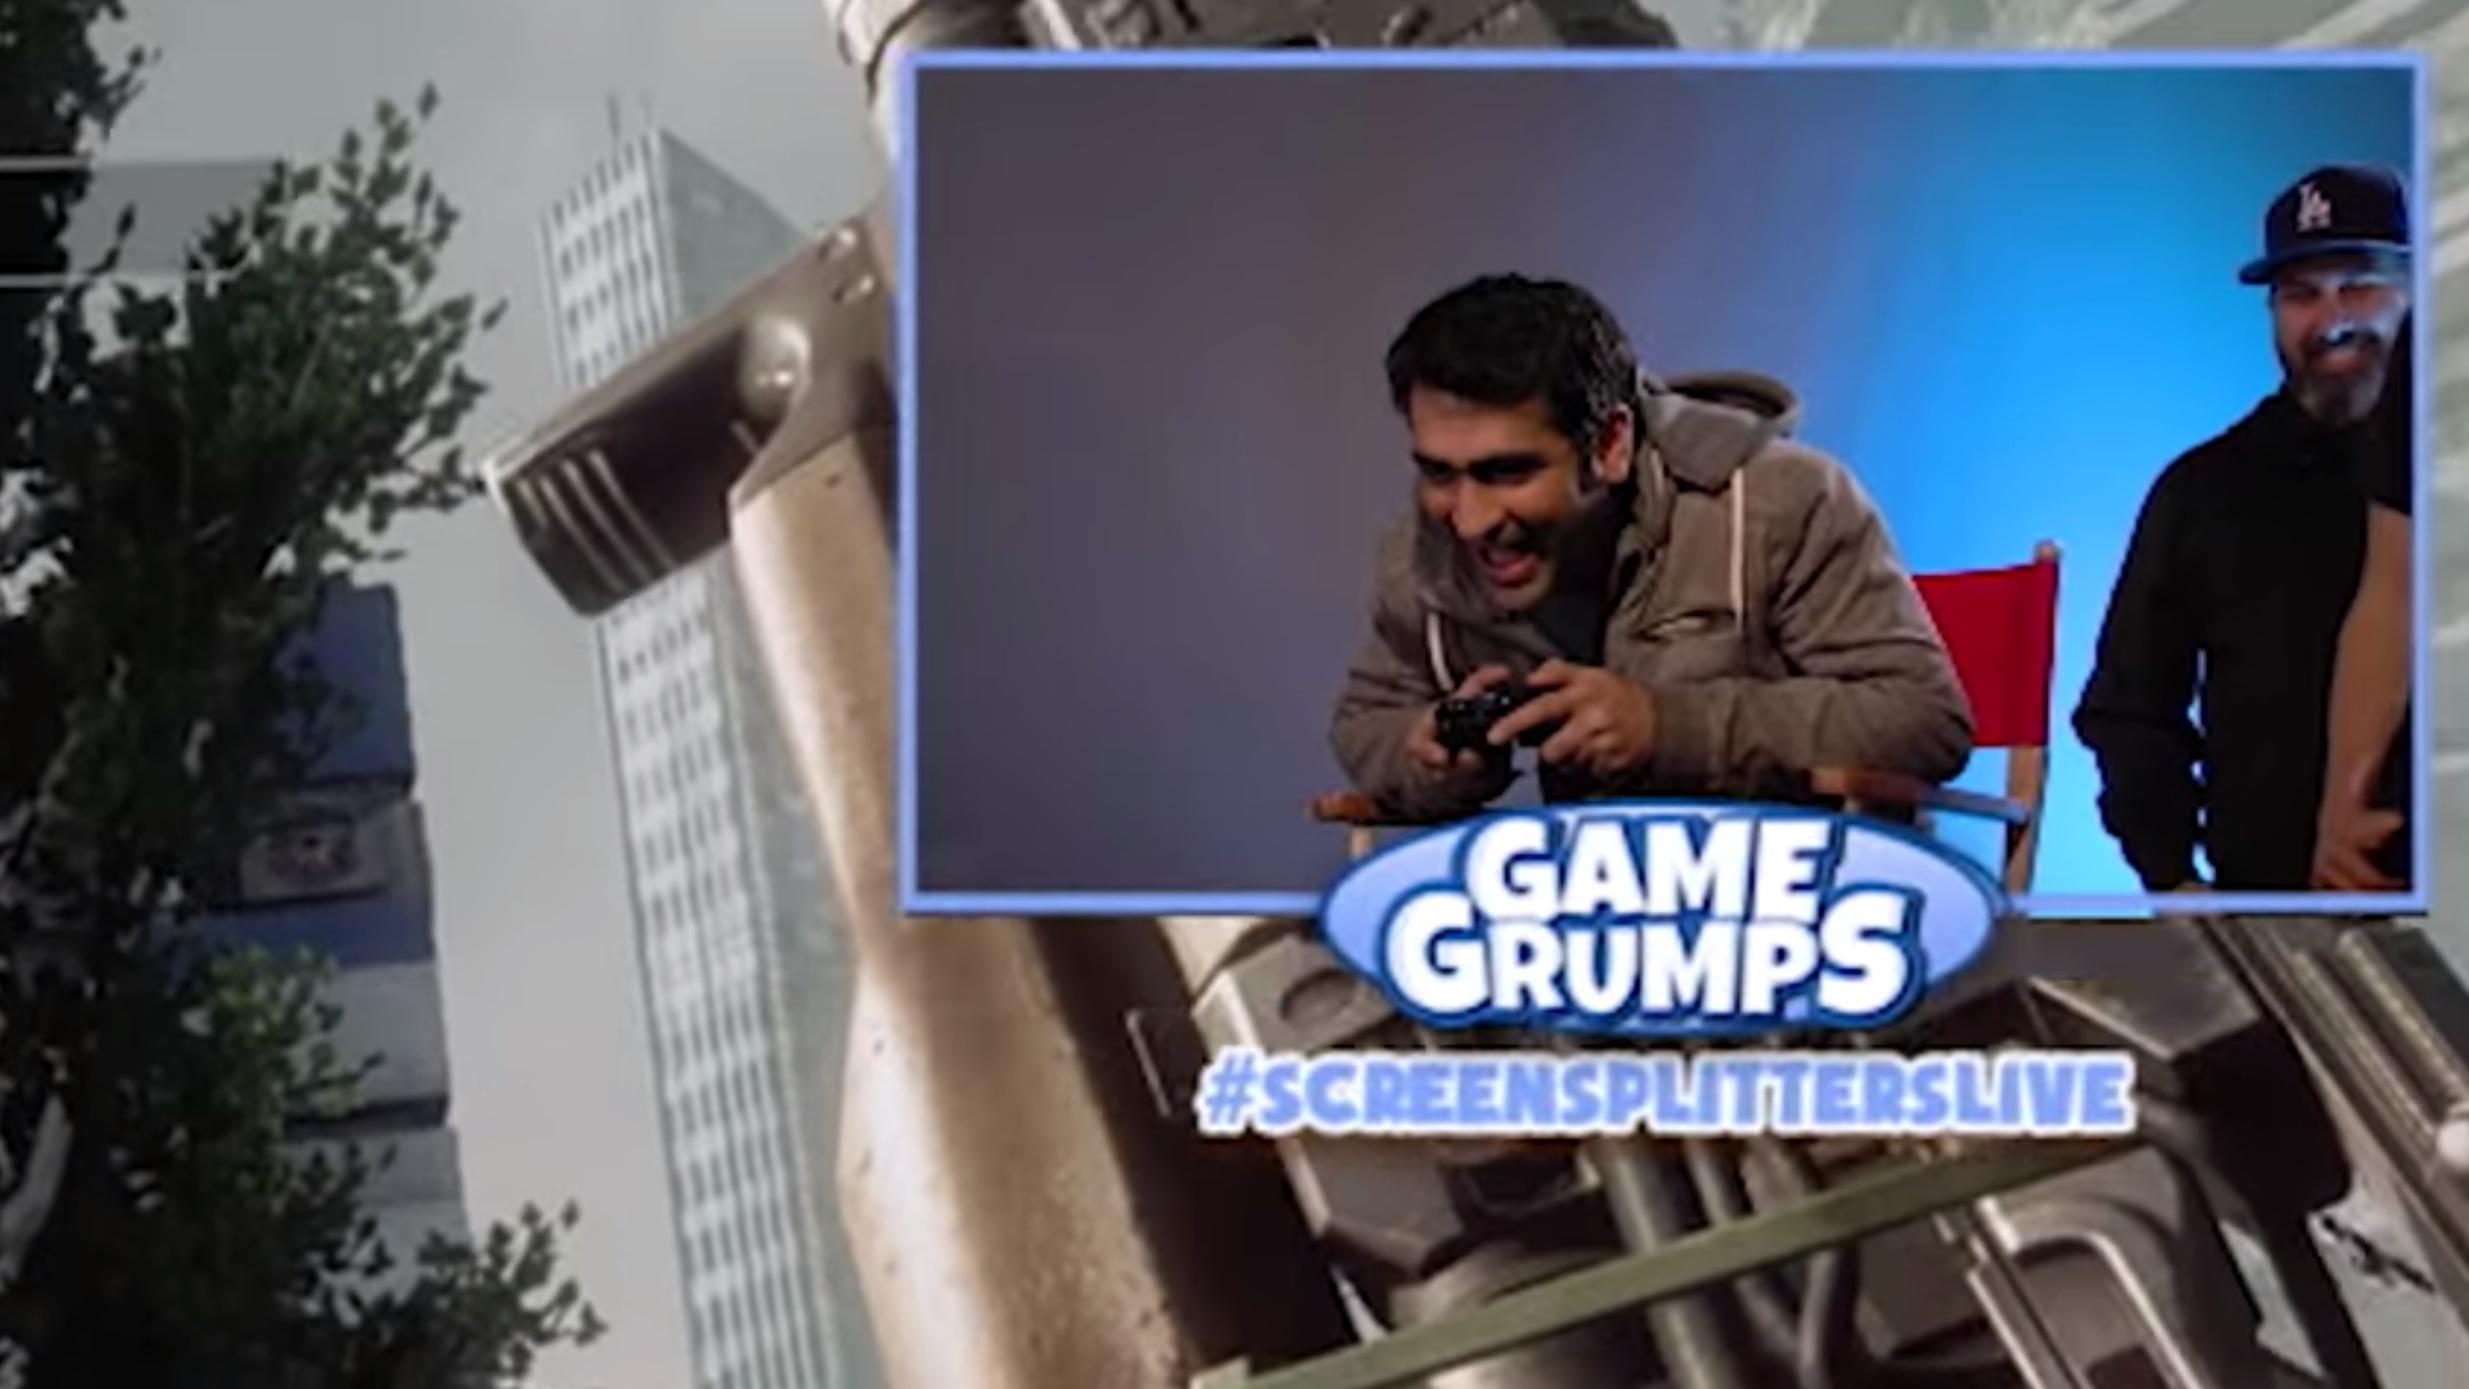 GameGrump: Titanfall 2